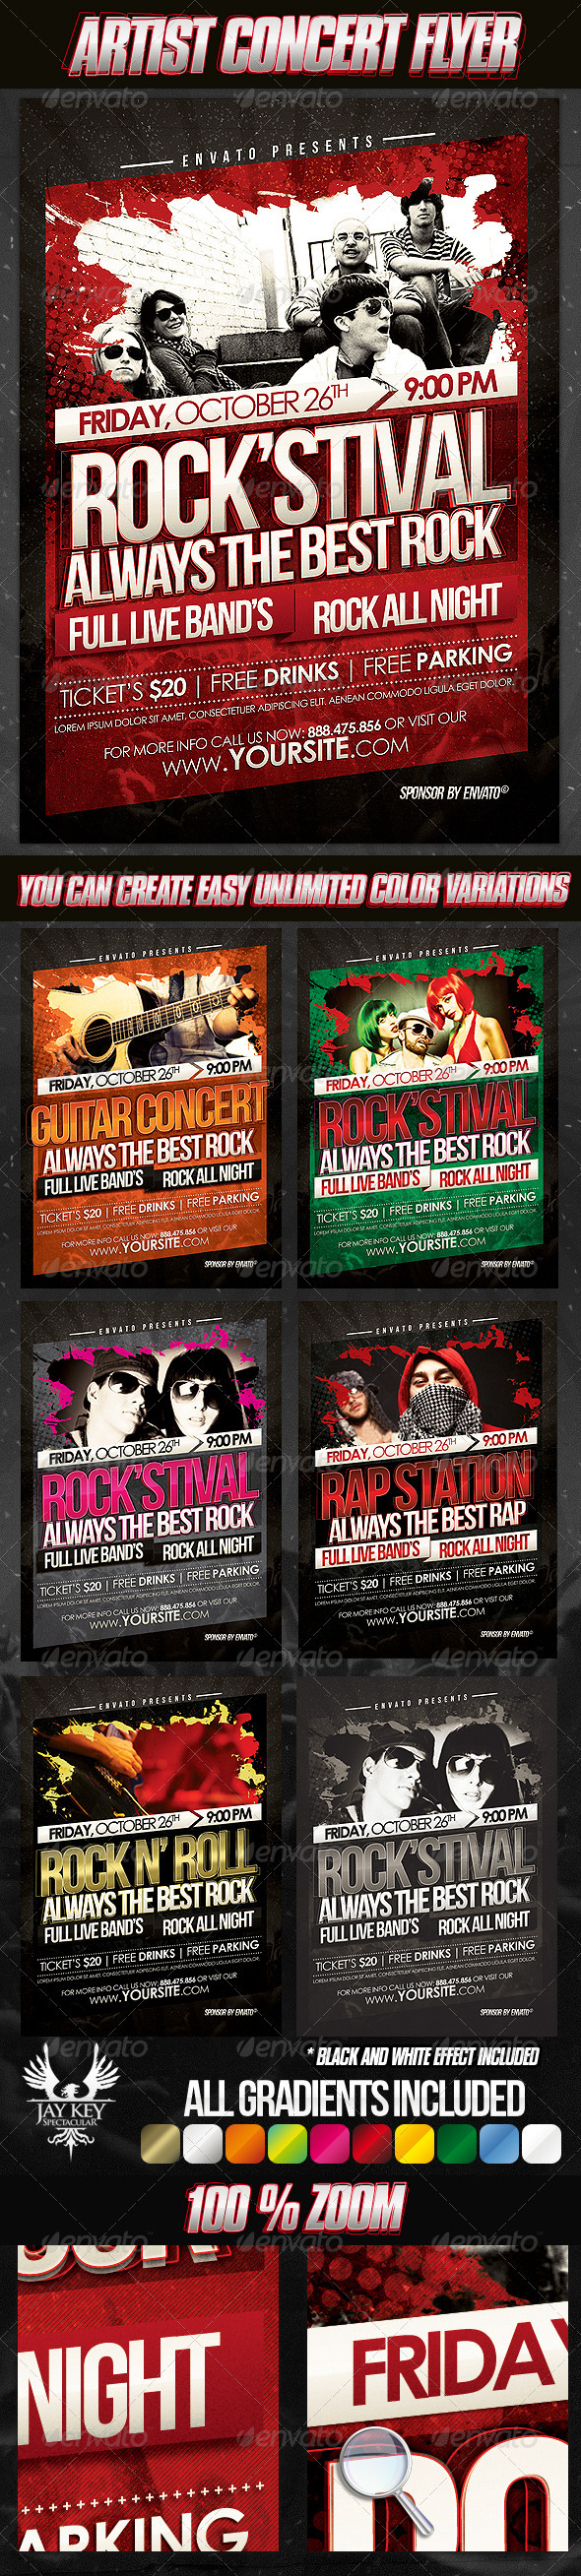 Artist Concert Flyer Template - Concerts Events